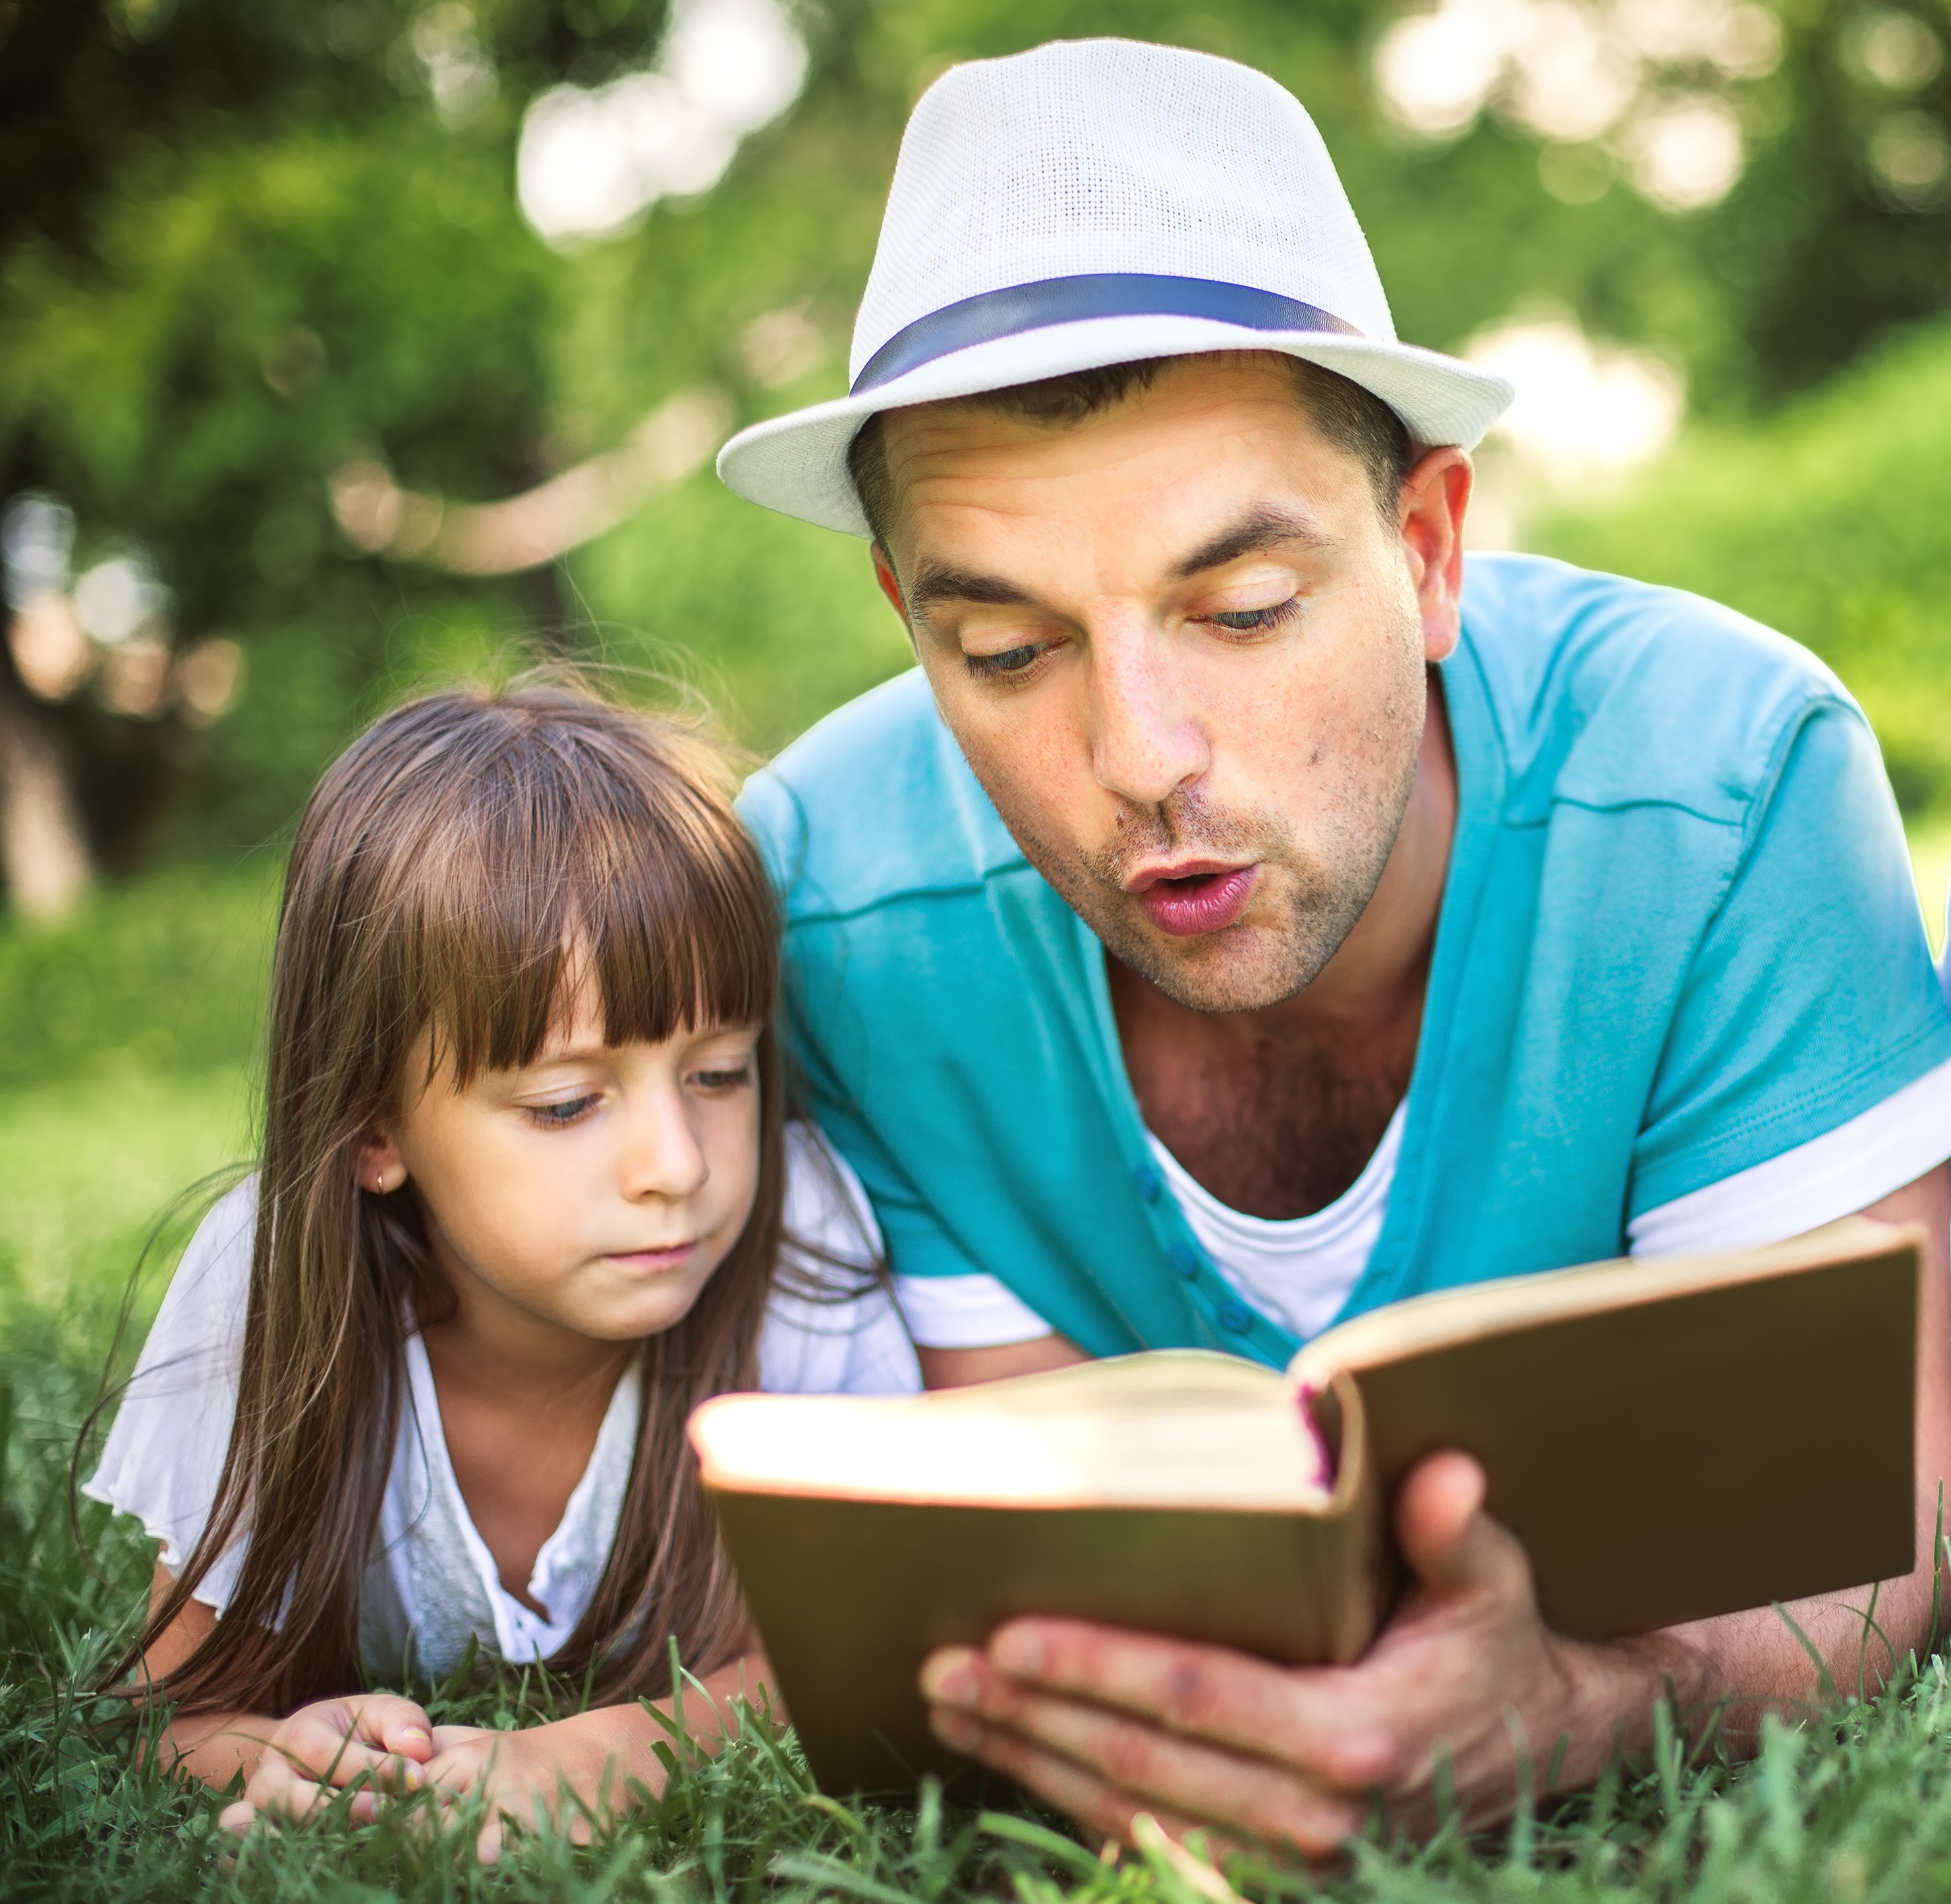 Man reading to girl